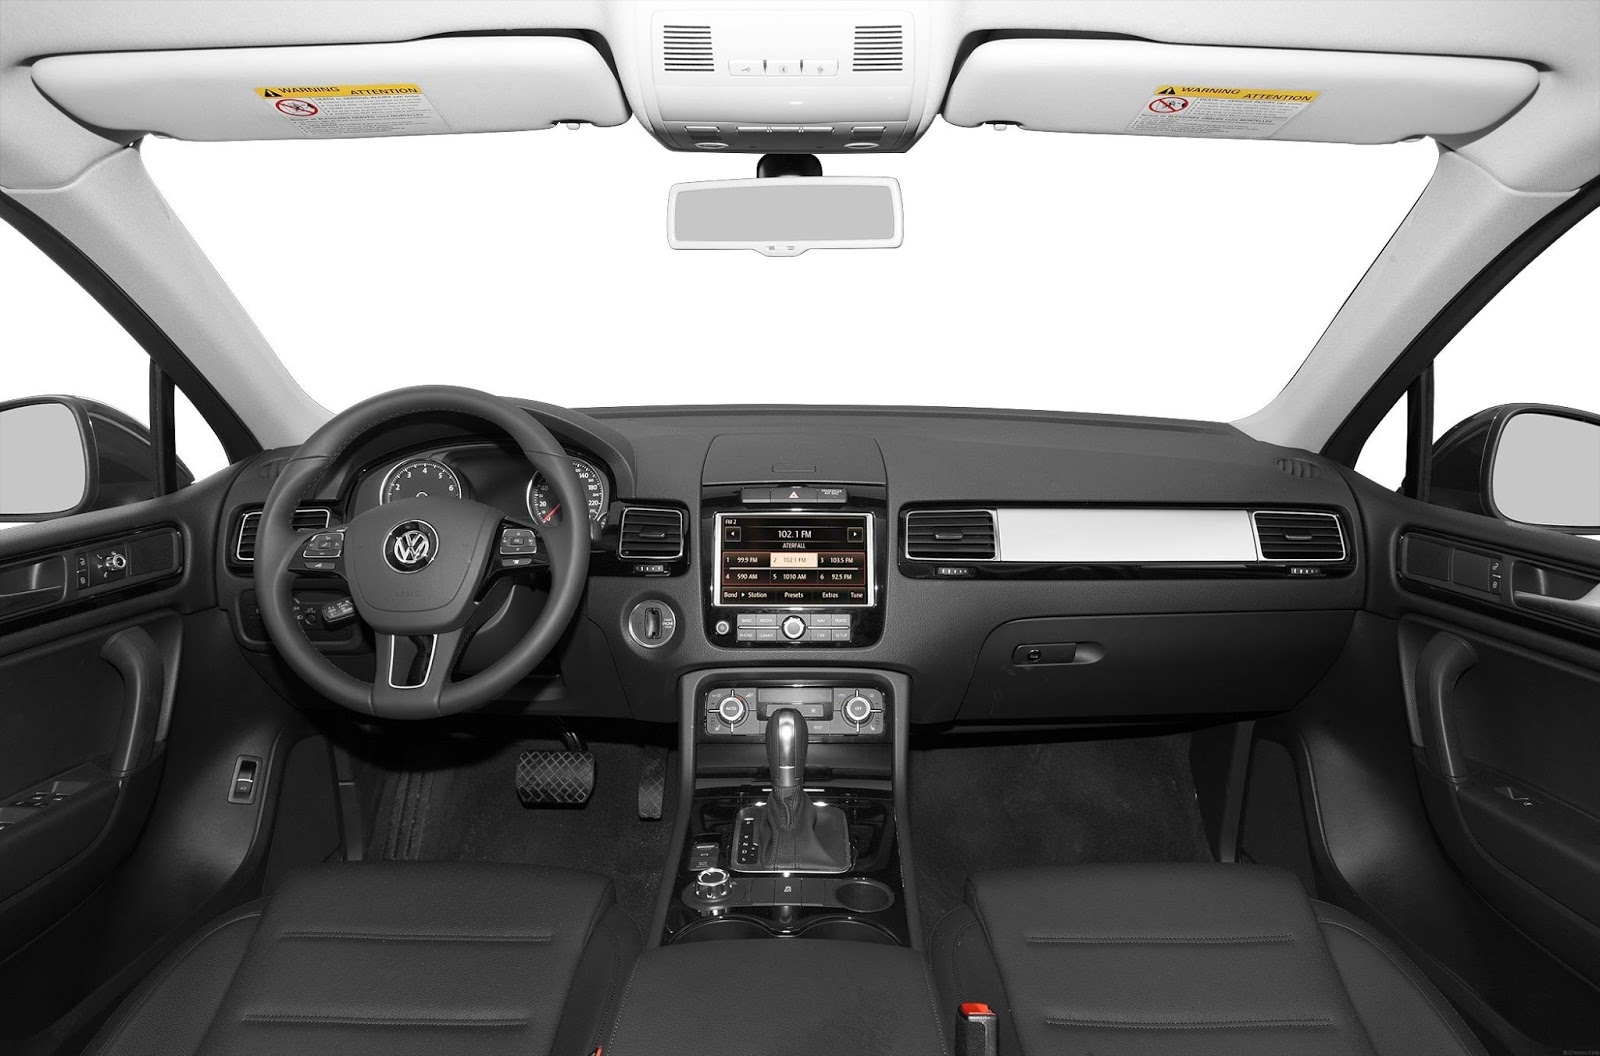 2015 Volkswagen Touareg CC 1600 x 900 HD